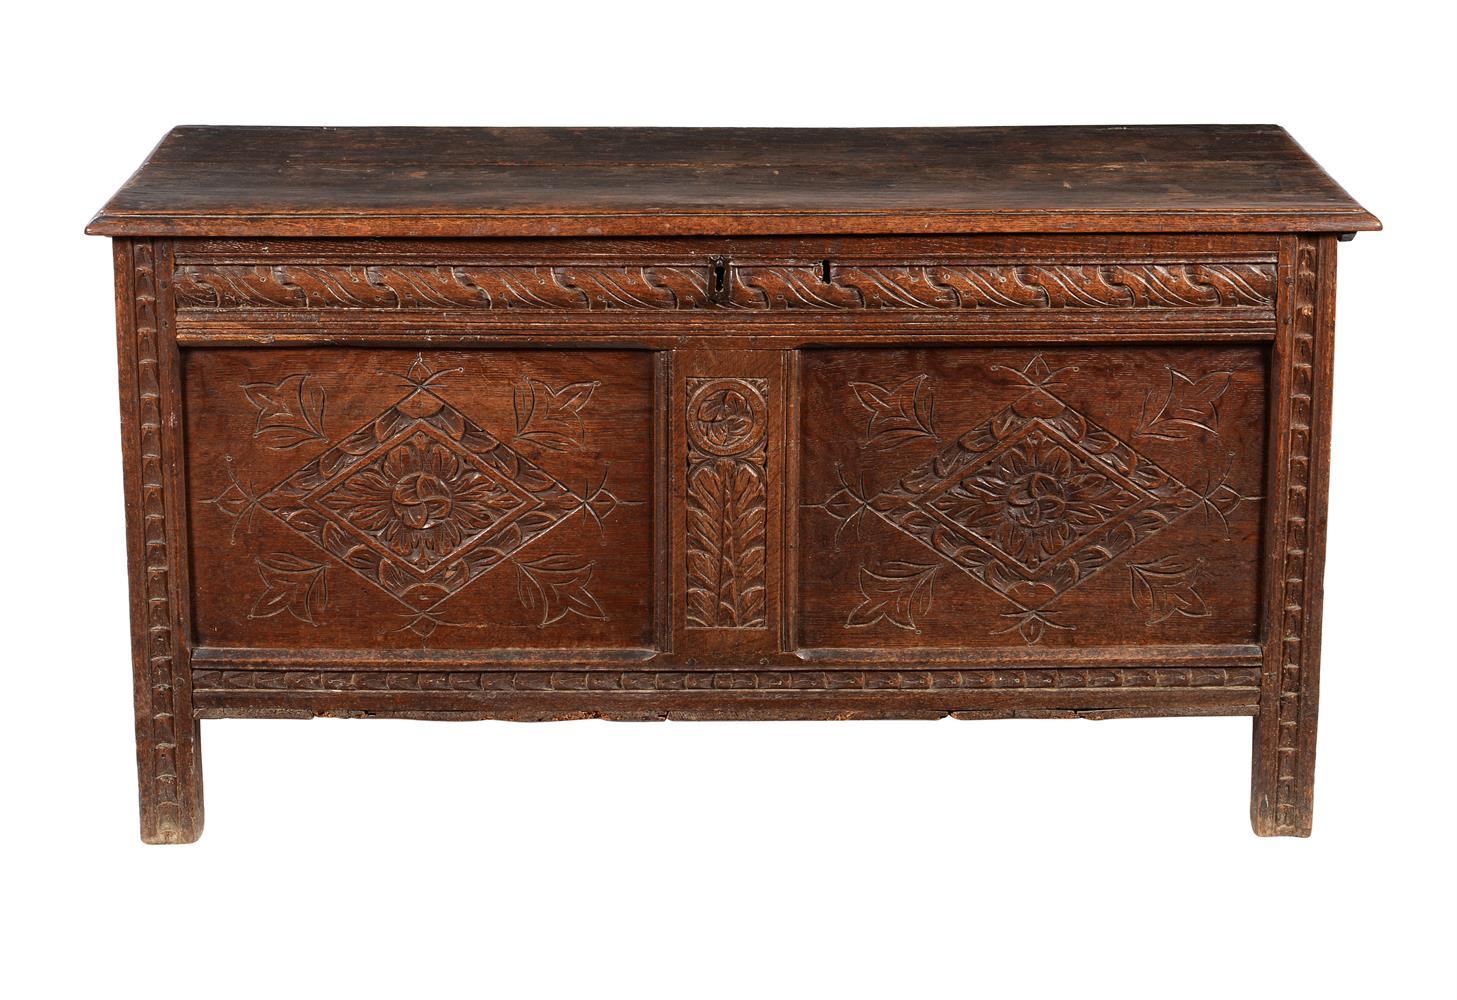 A carved oak coffer